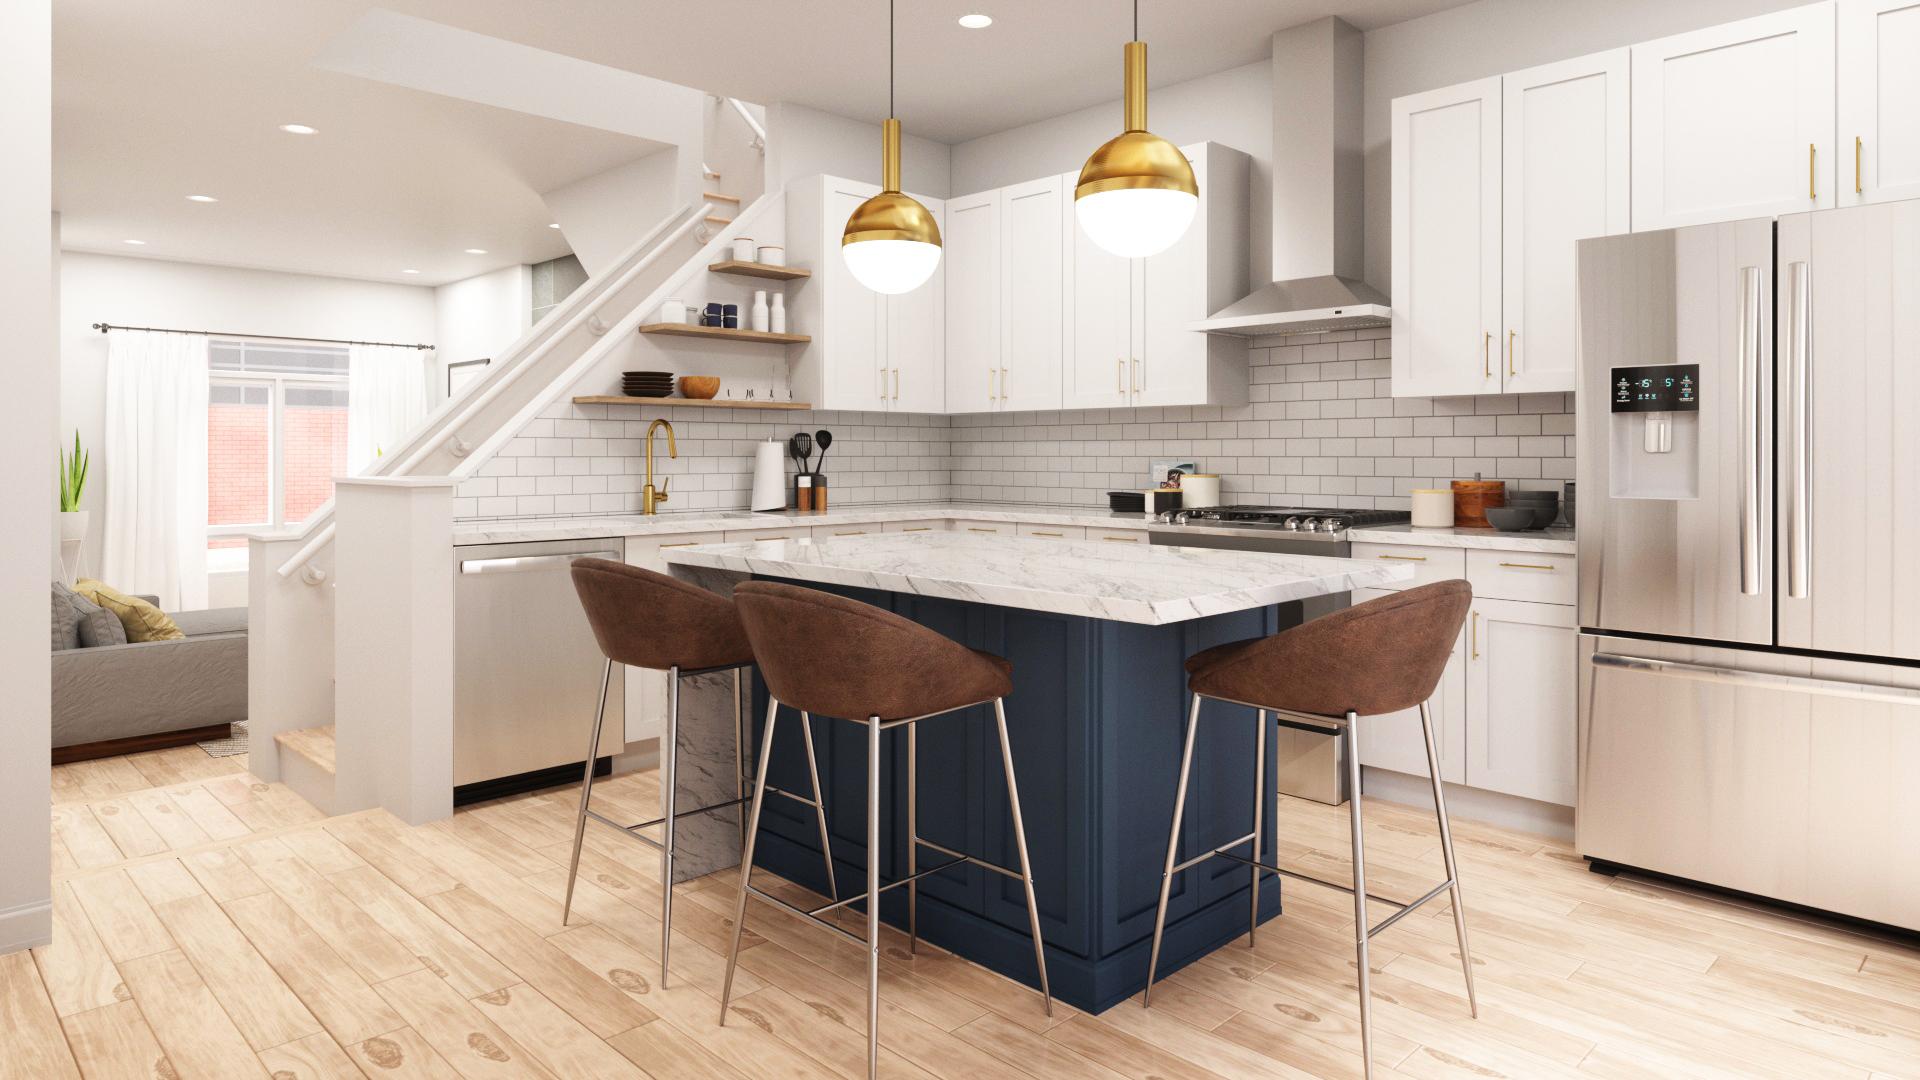 19014201-H2 Townhomes_Interior_Web_Kitchen 02